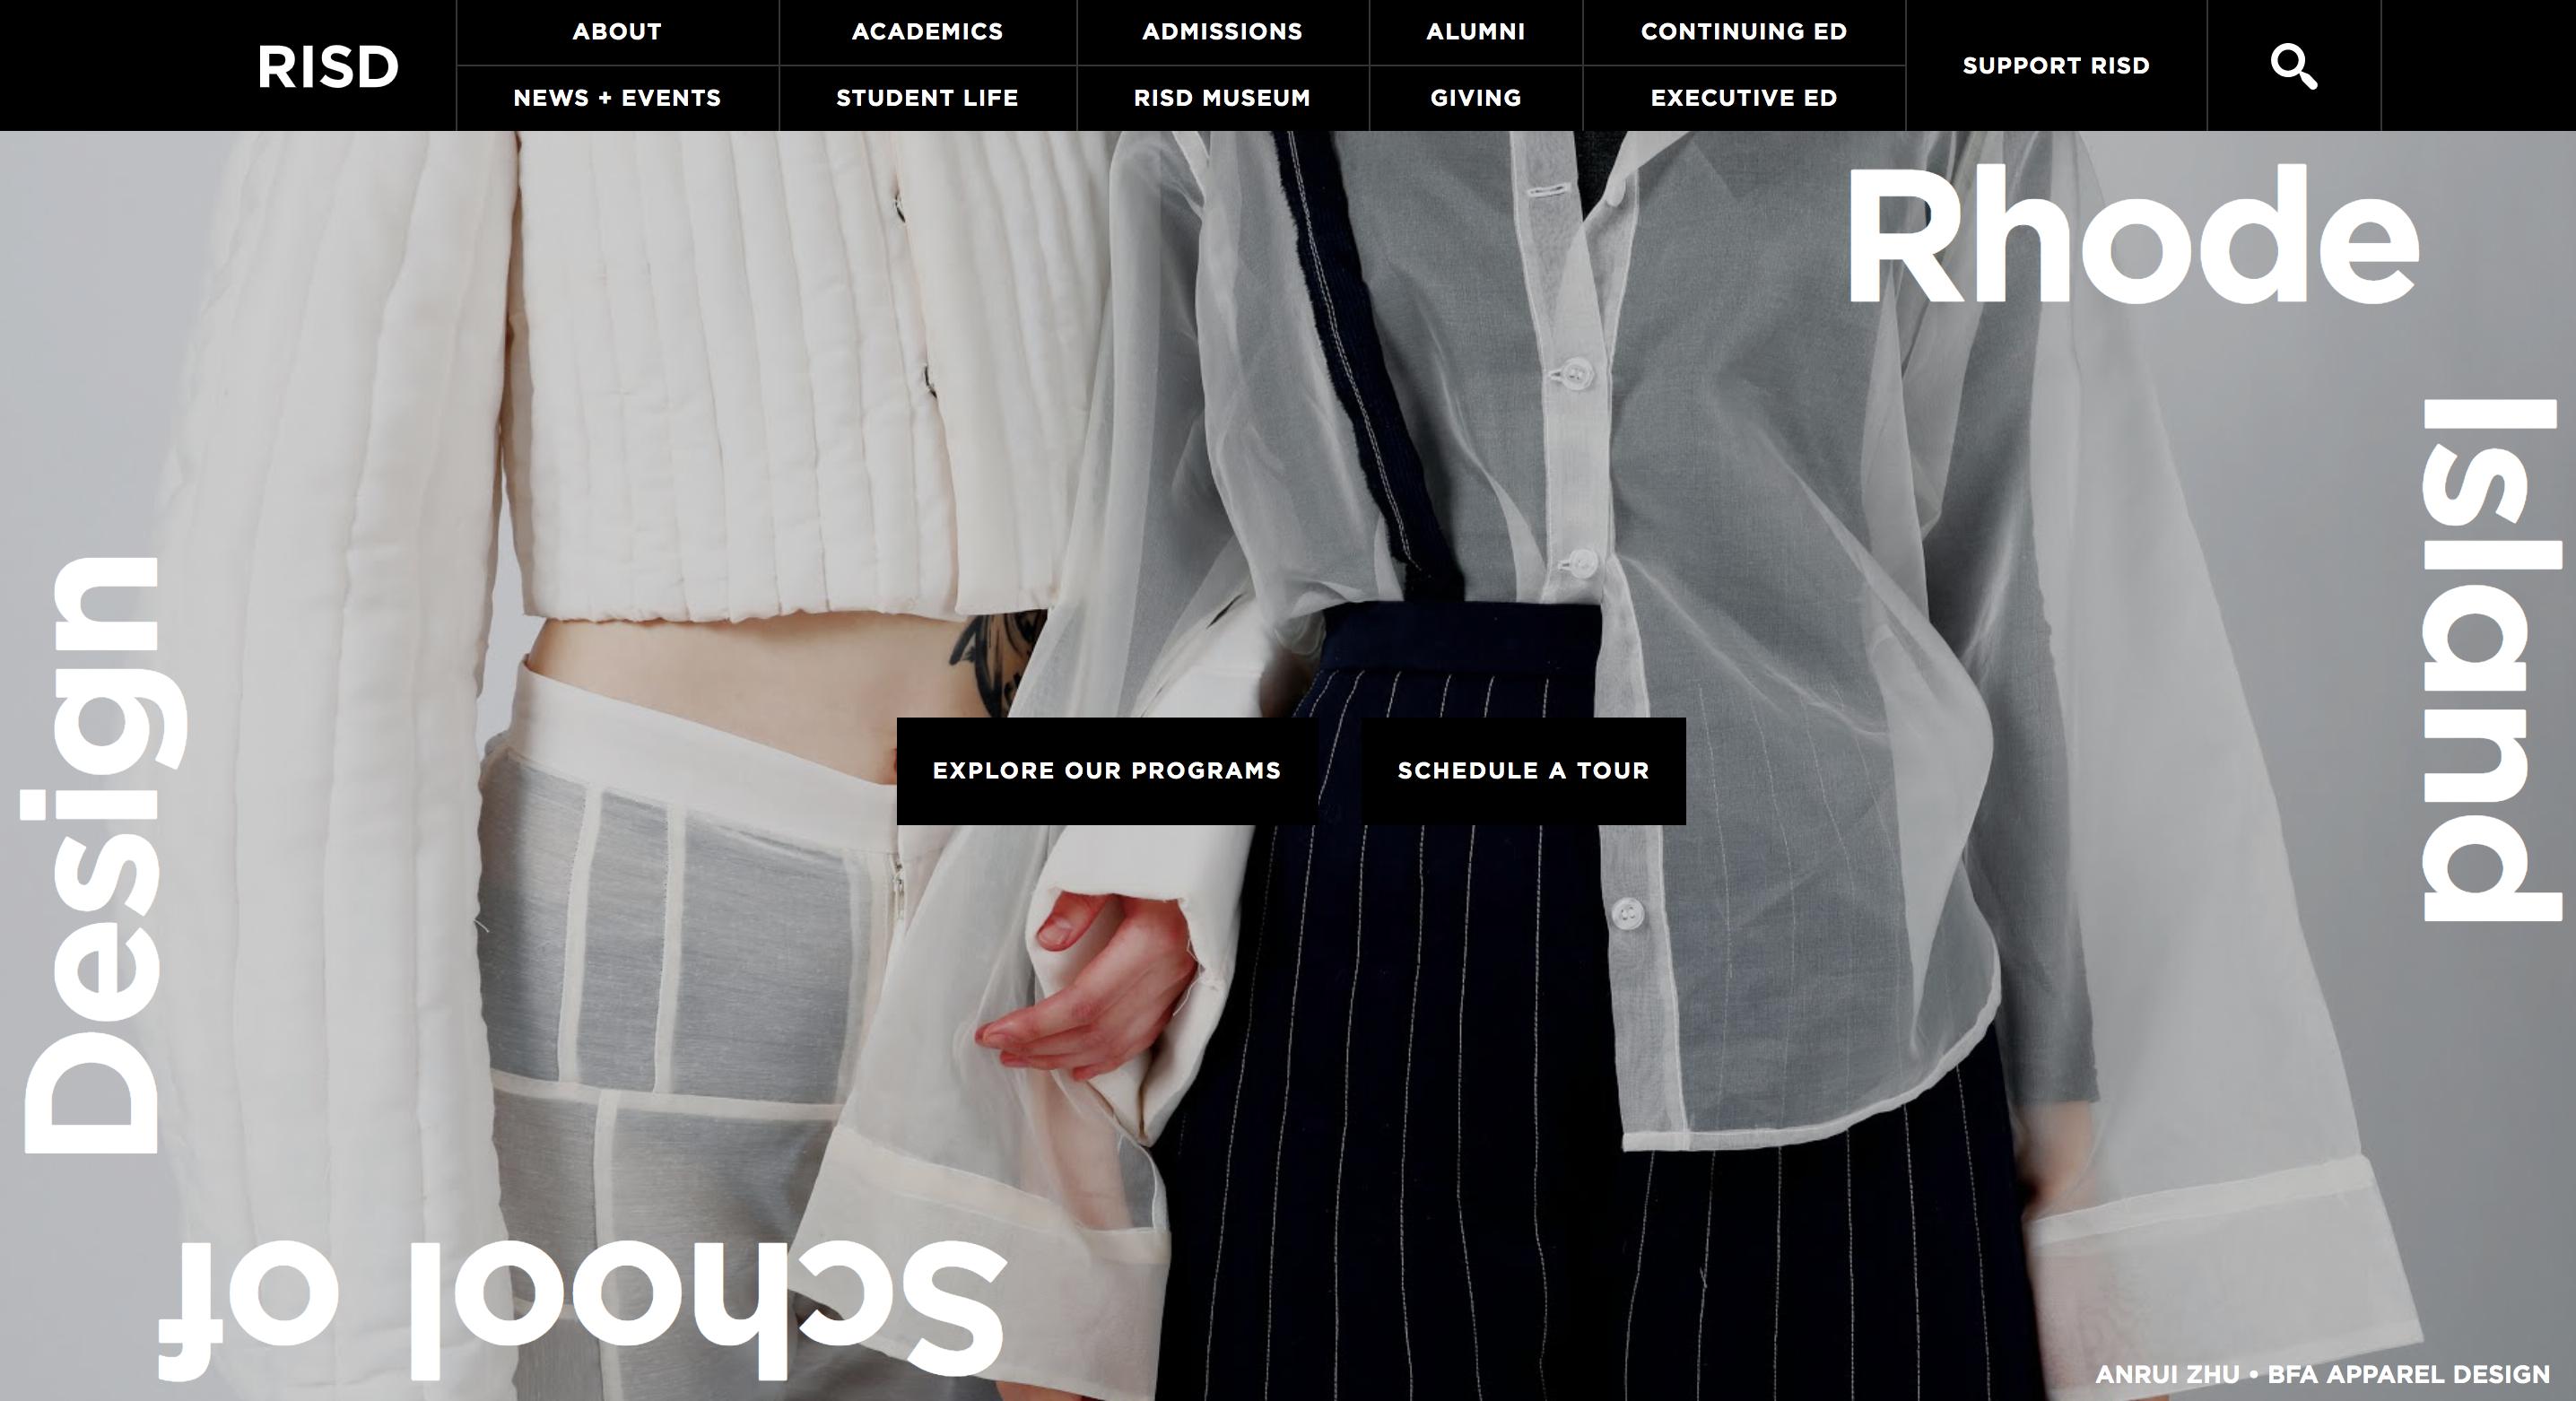 Rhode Island, School of Design | ADventure Marketing